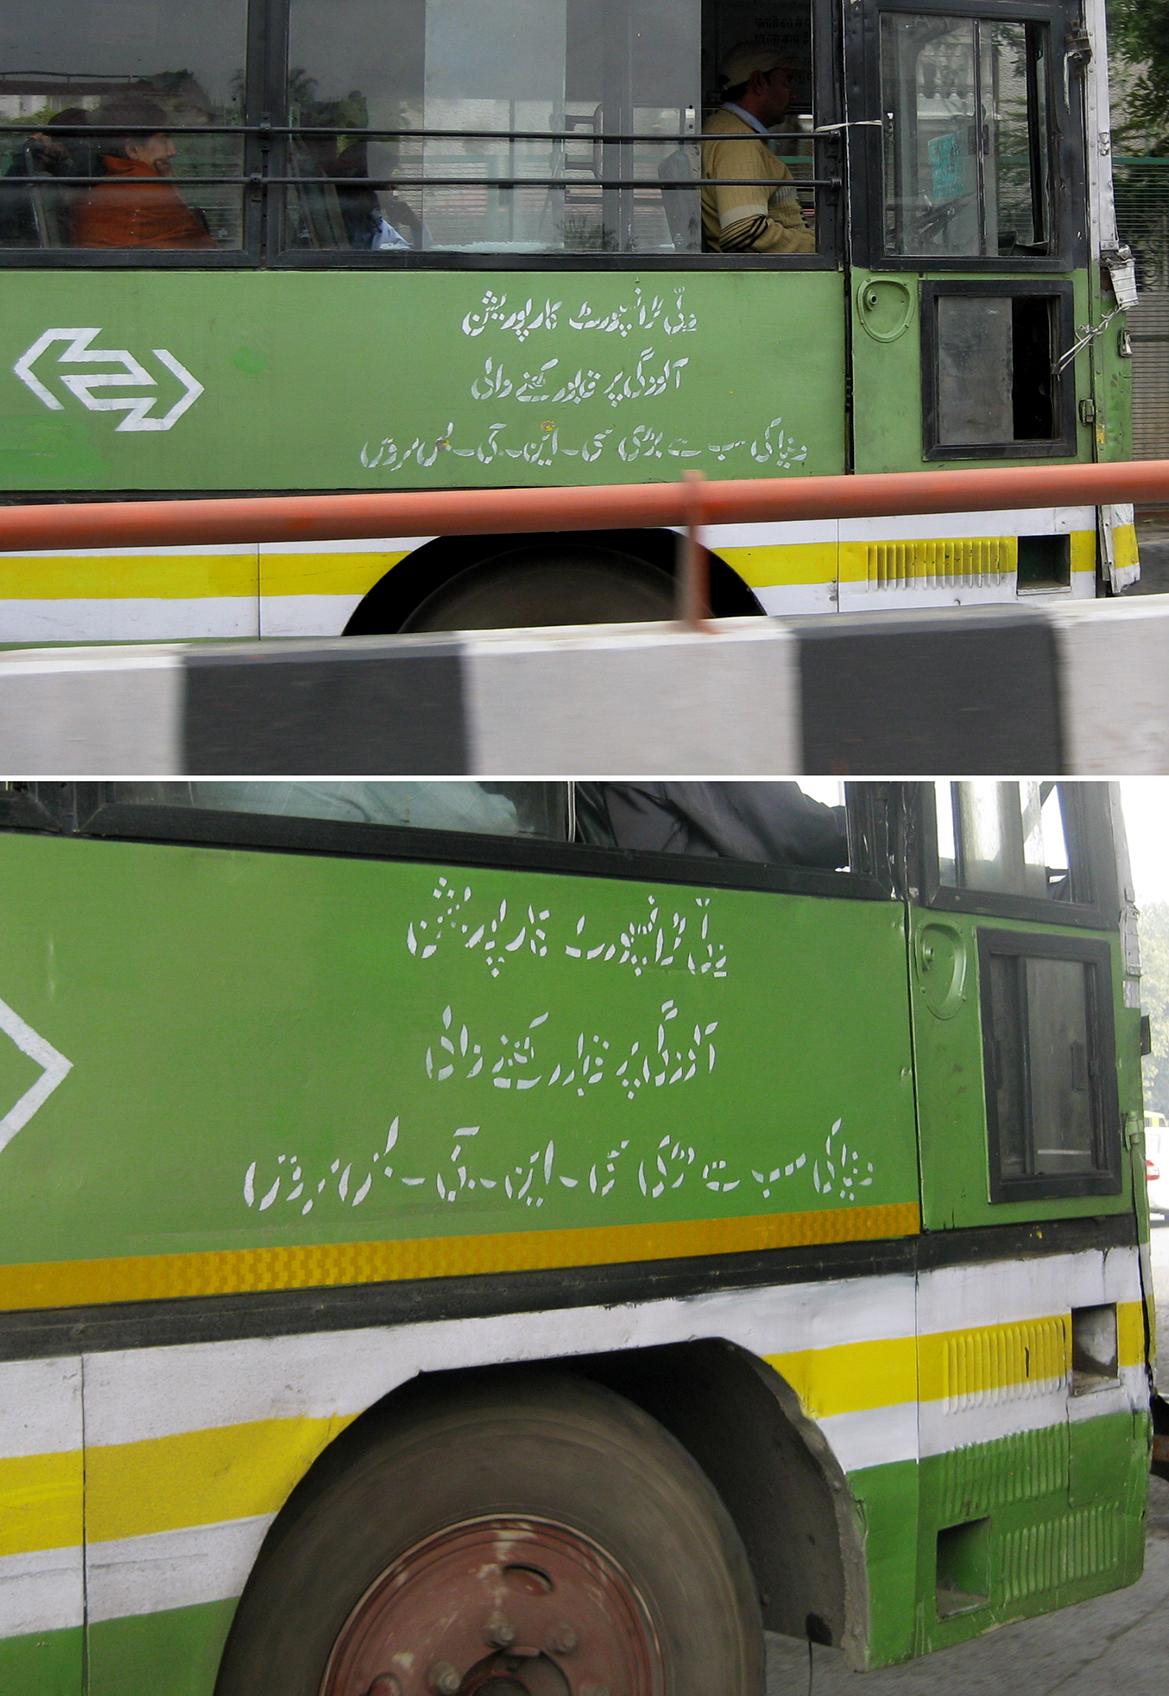 Urdu stencil bus lettering